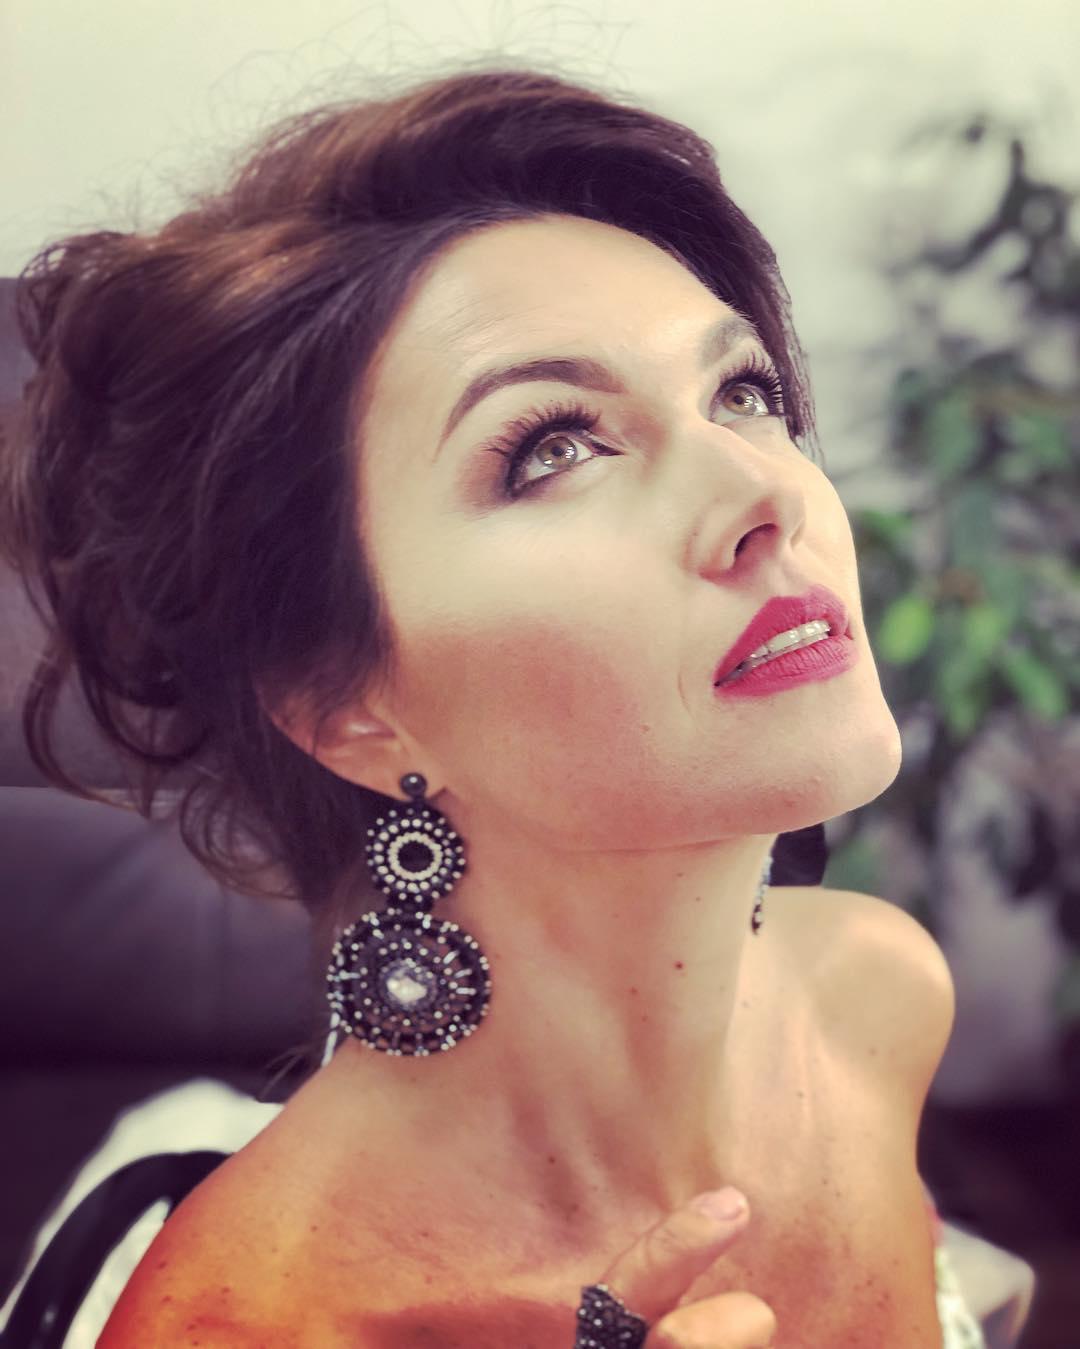 Юлия Такшина: Вчера посчастливилось провести конкурс красоты во Владивостоке. Спасибо @tatianakaplun_official @salon_love_forever #tatianakaplun#татьянакаплун#kookla #звёздывплатьеоткаплун за волшебное платье.И @yakischik_jewelry  #серьги_yakischik #кольца_yaki...